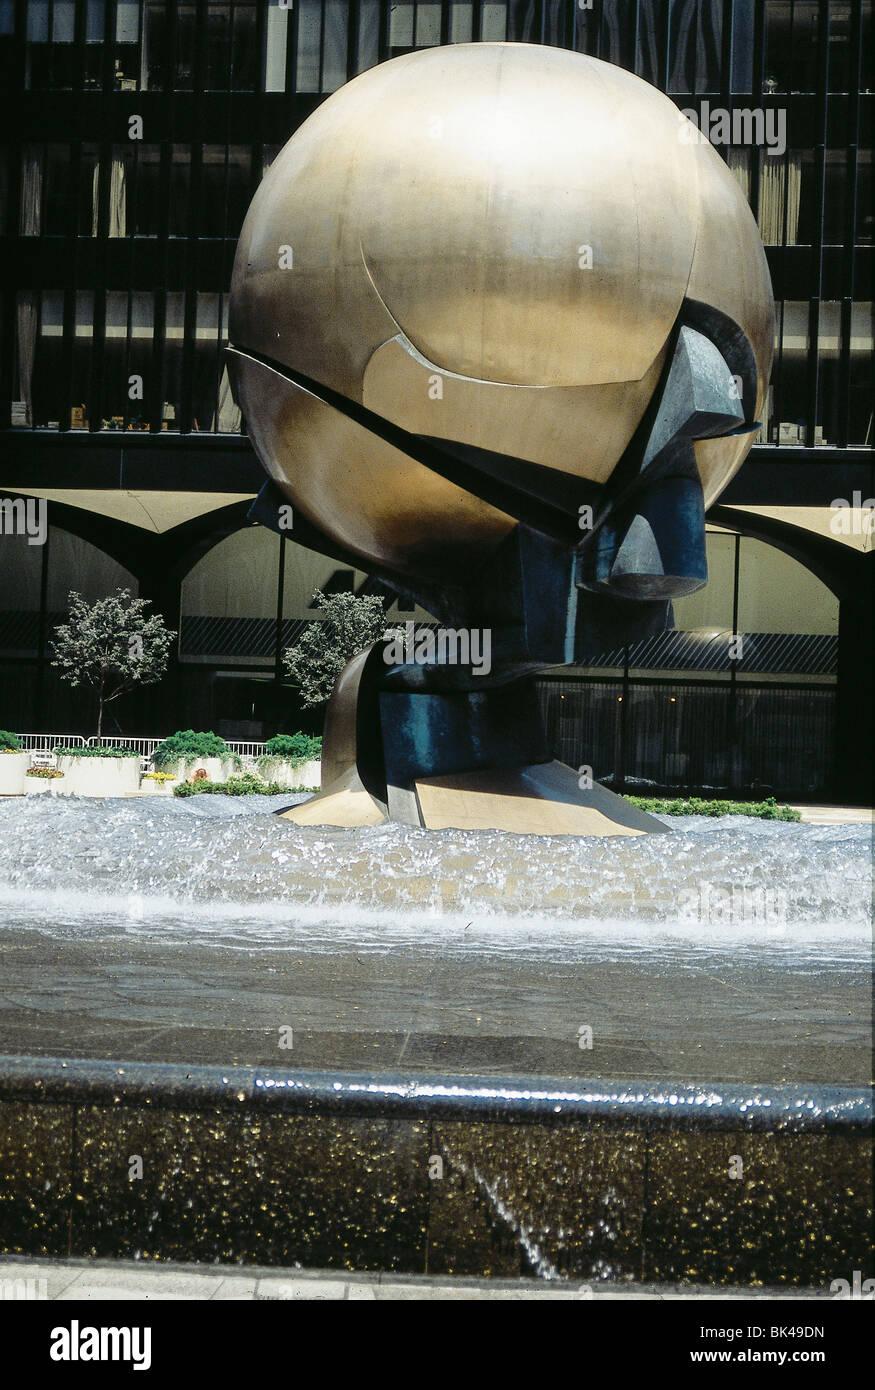 1971 Sculpture 'Kugelkaryatide' by Fritz Koenig at the World Trade Center Tobin Plaza, New York - Stock Image